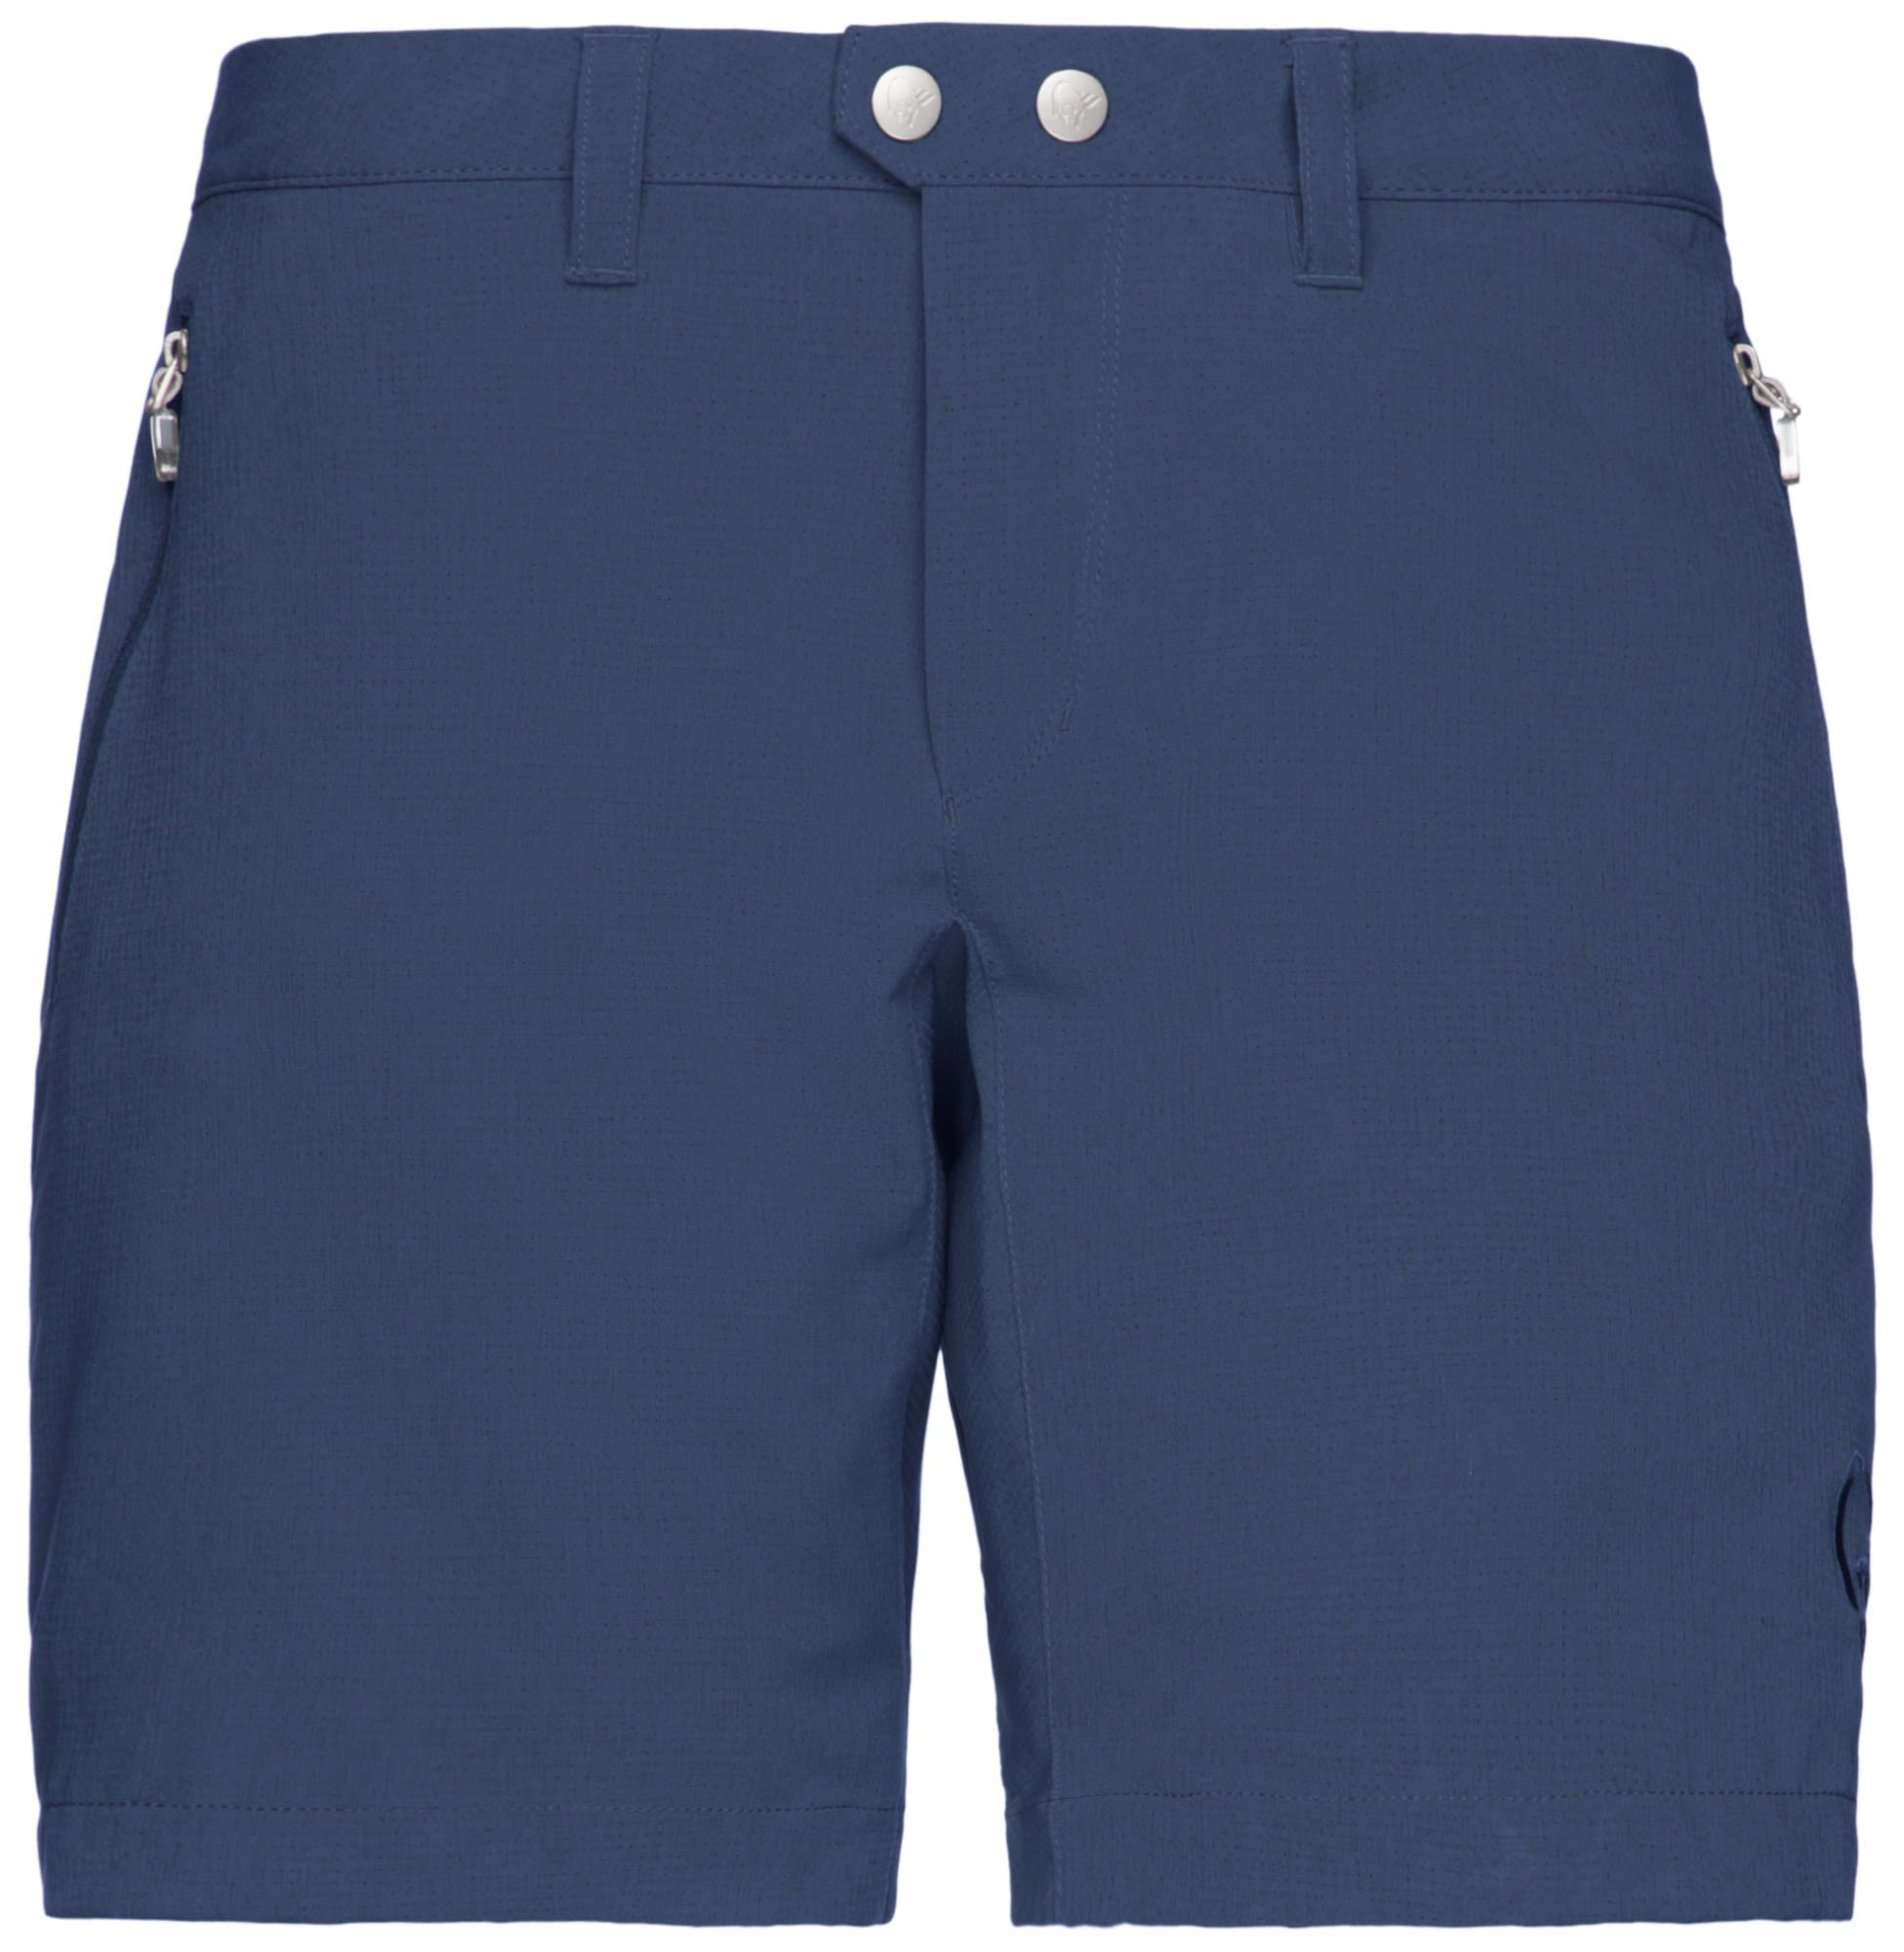 Norrona Bitihorn Flex1 Shorts Blau, Female Shorts, M